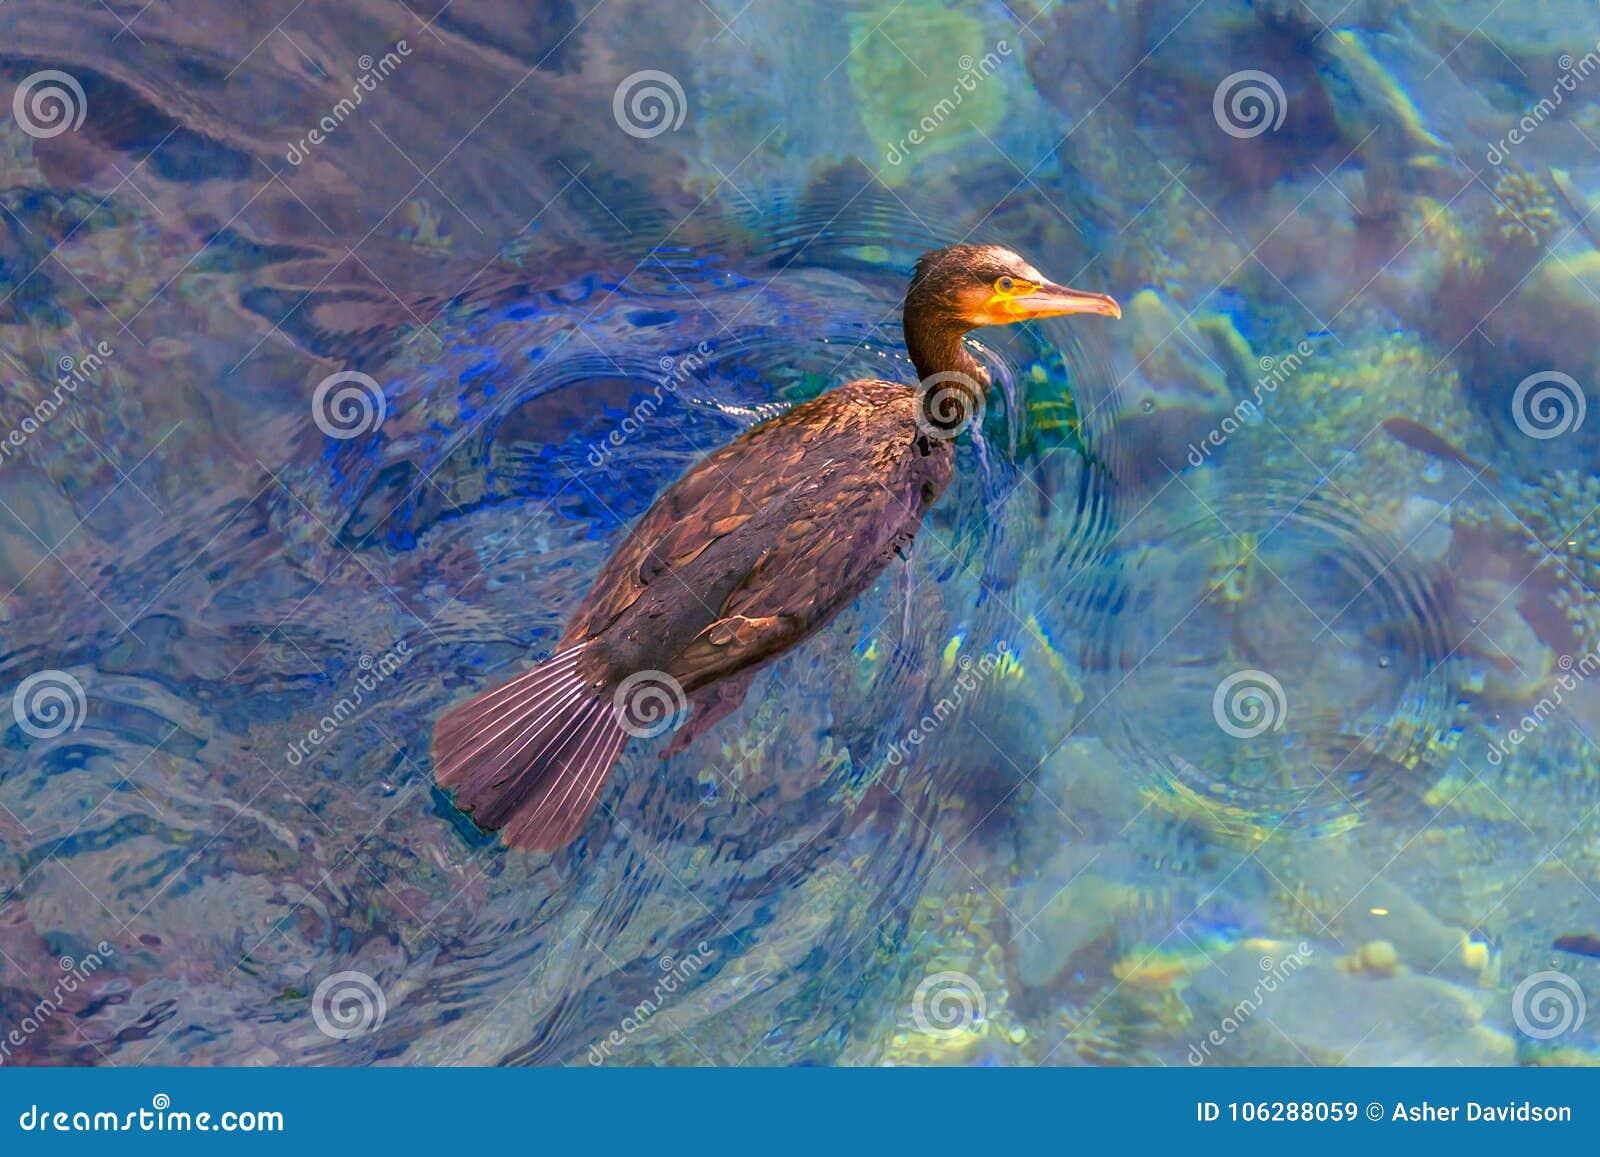 The big sea predator bird